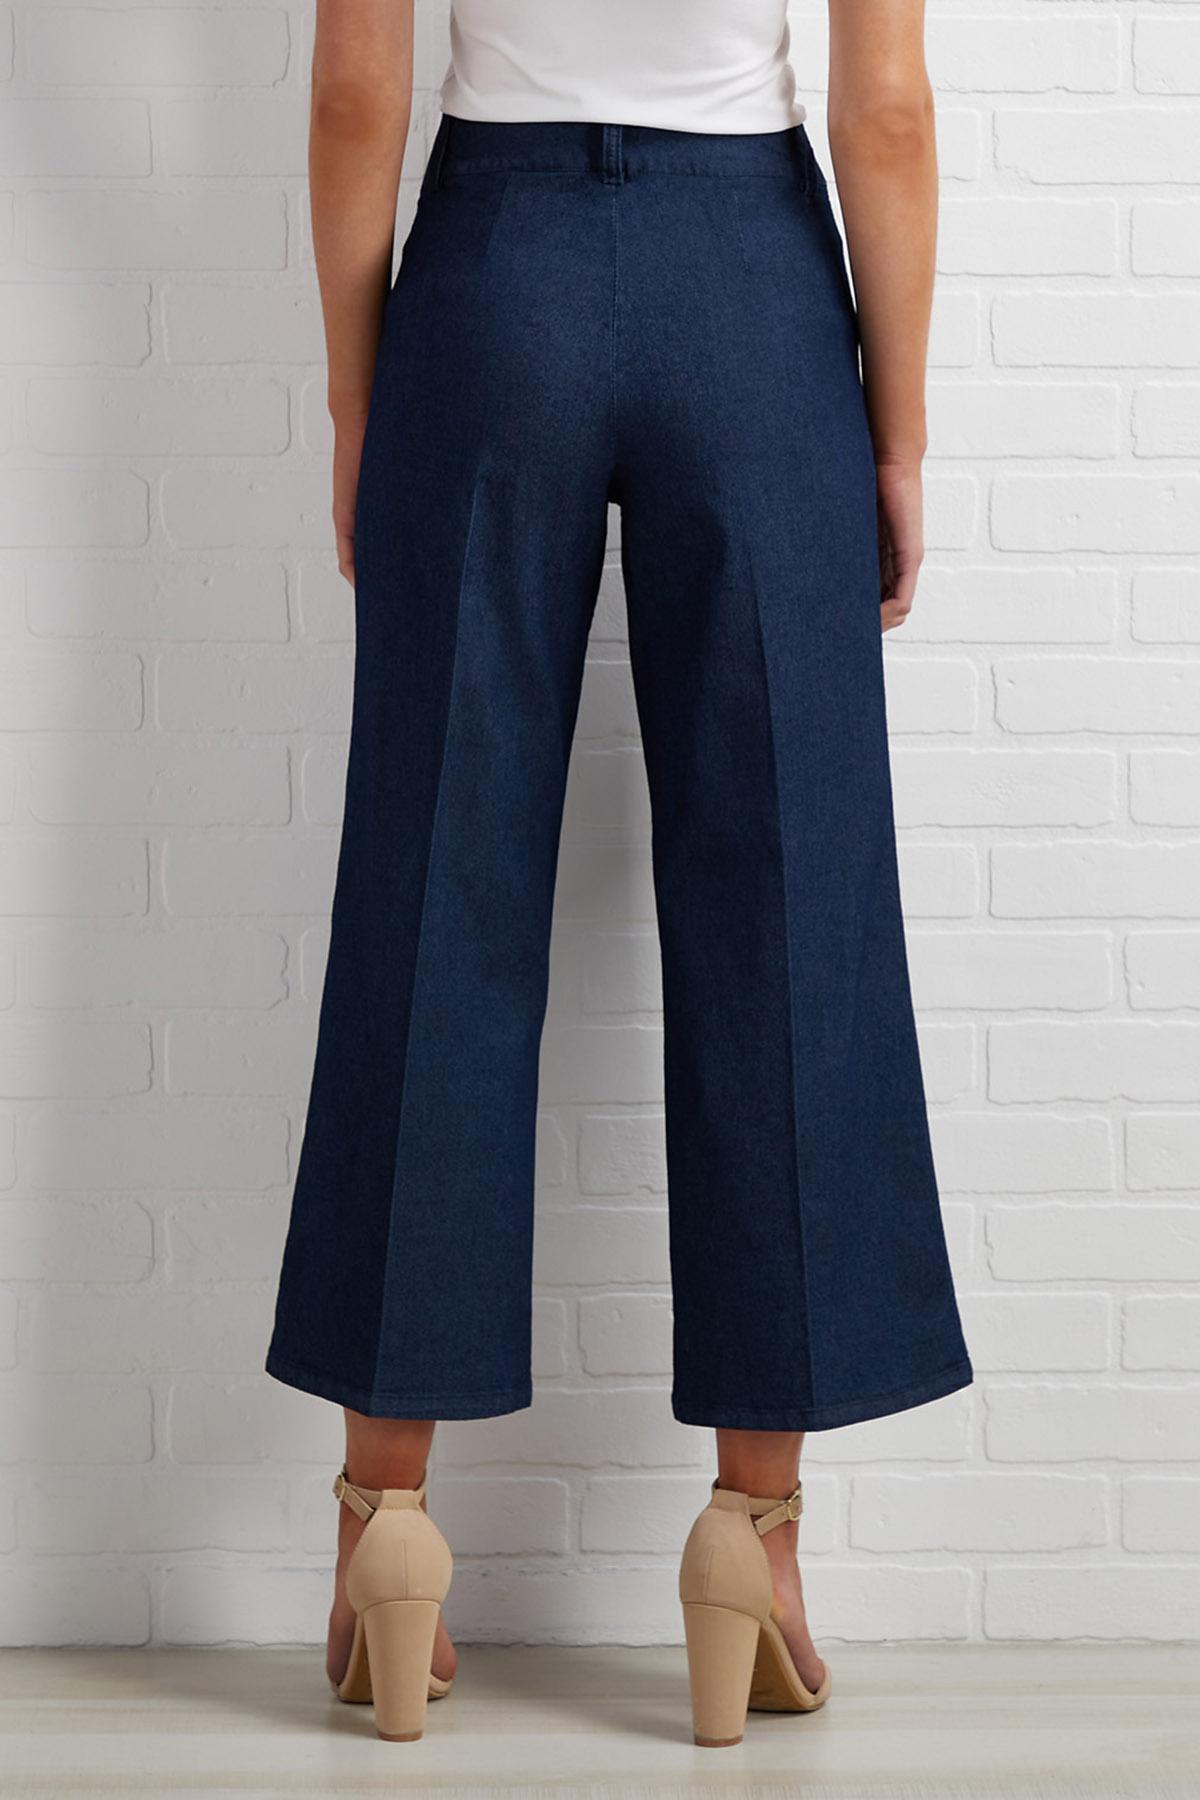 Hey Sailor Pants